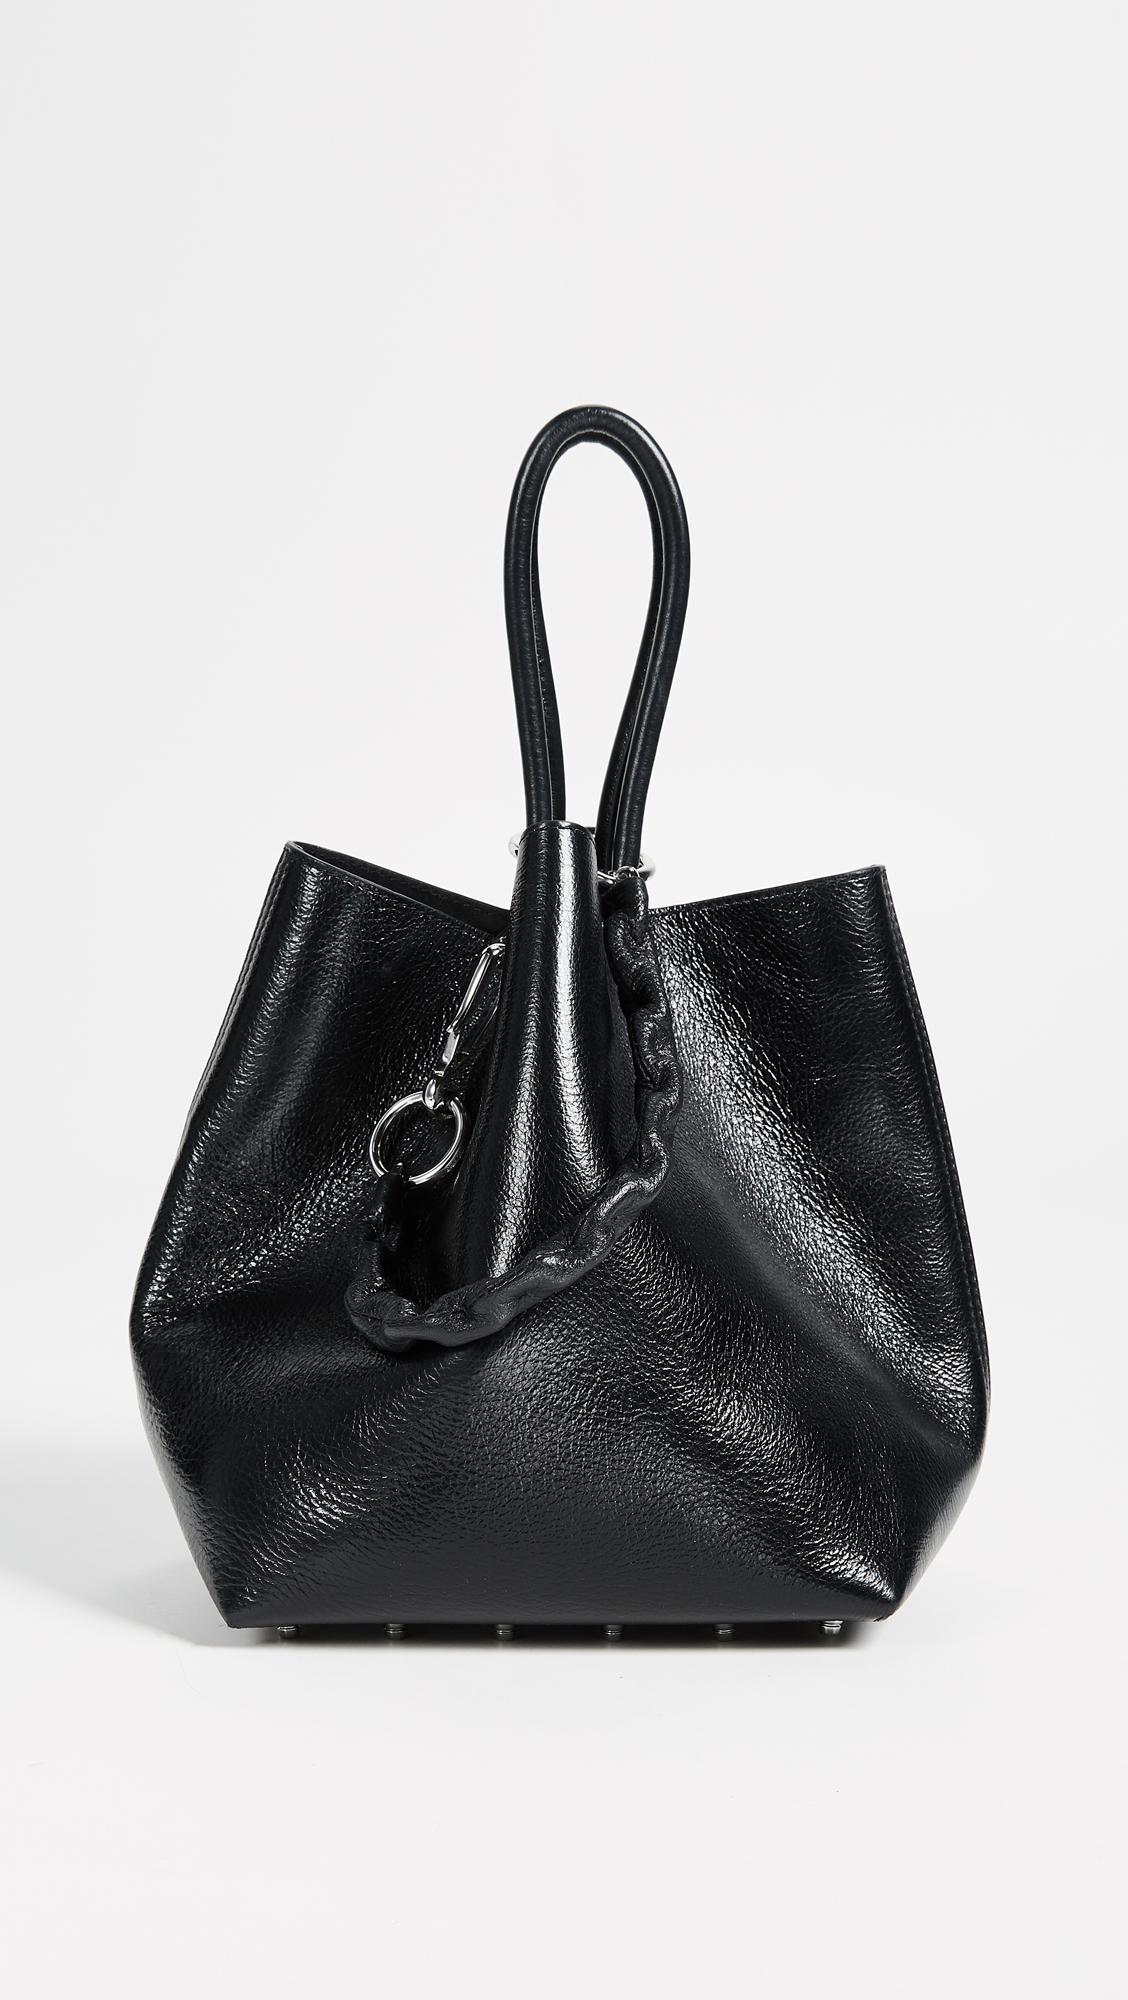 Roxy Small Tote Bag in Black Calfskin Alexander Wang lyV6q